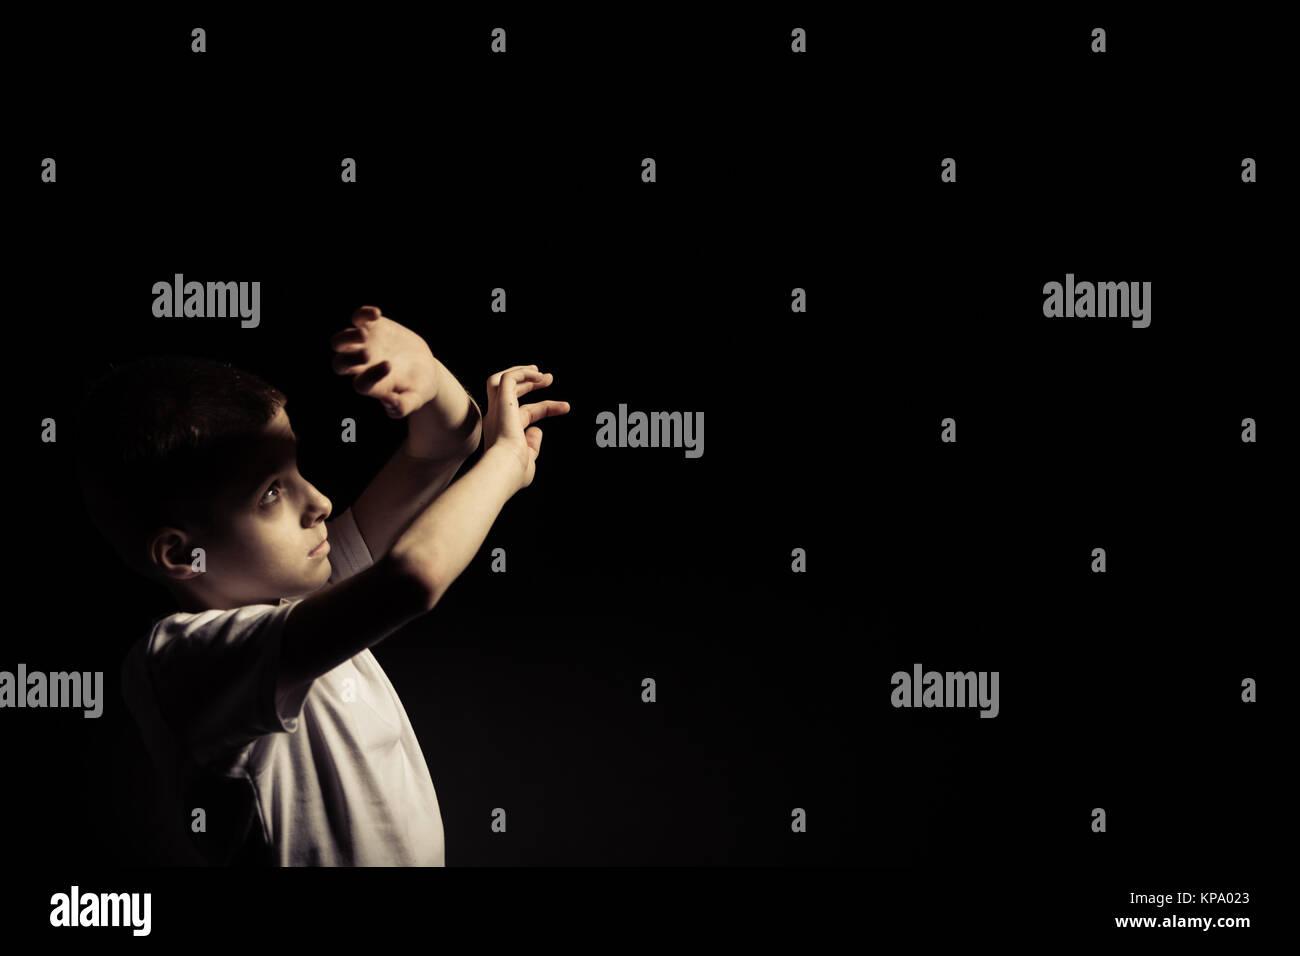 divine lighting. Boy Looking Up While Covering Light Against Black - Stock Image Divine Lighting